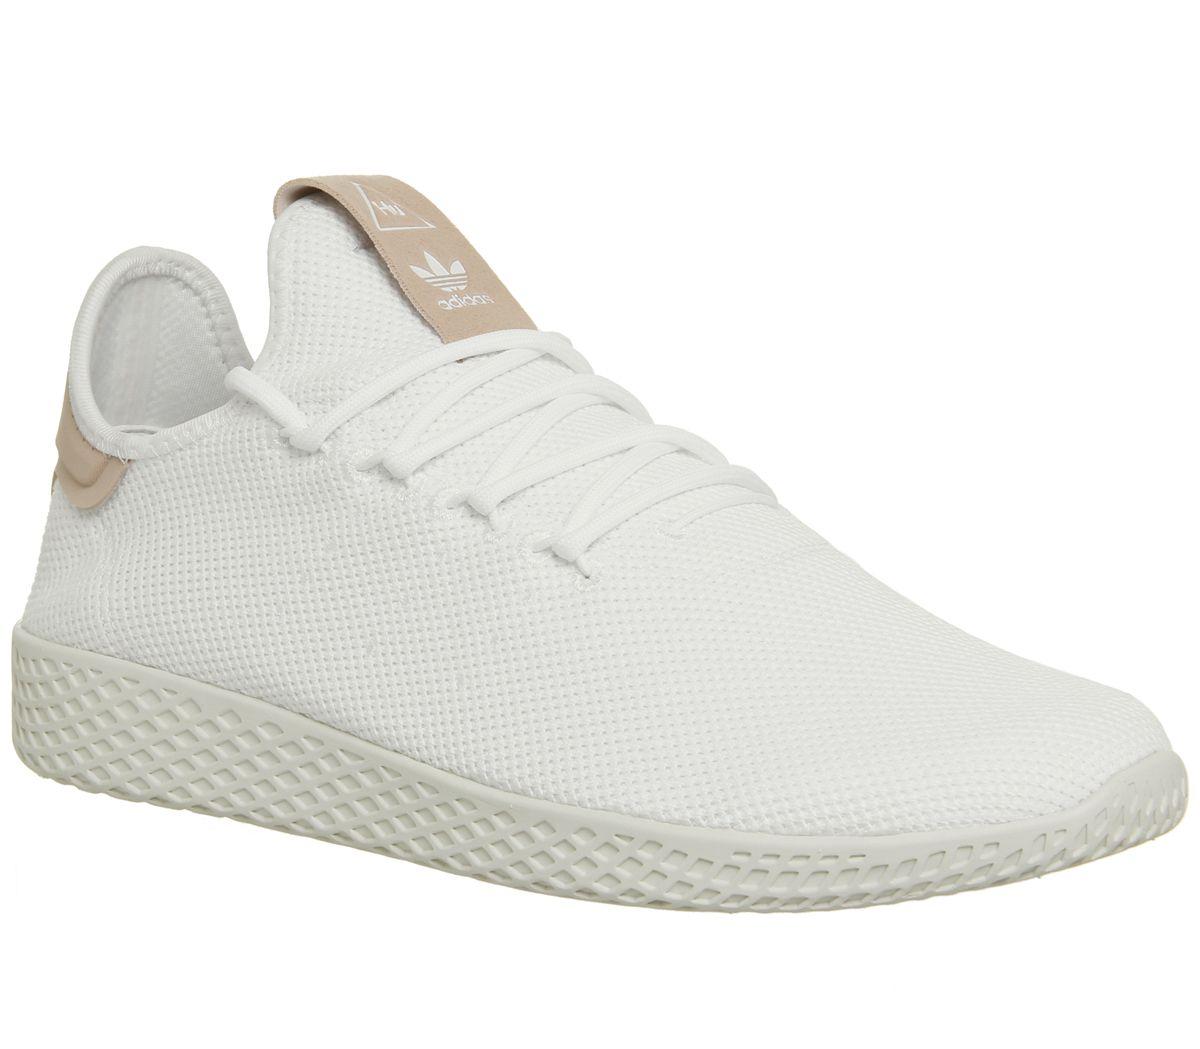 6b286dbe55179 adidas Pw Tennis Trainers White White Linen - Unisex Sports